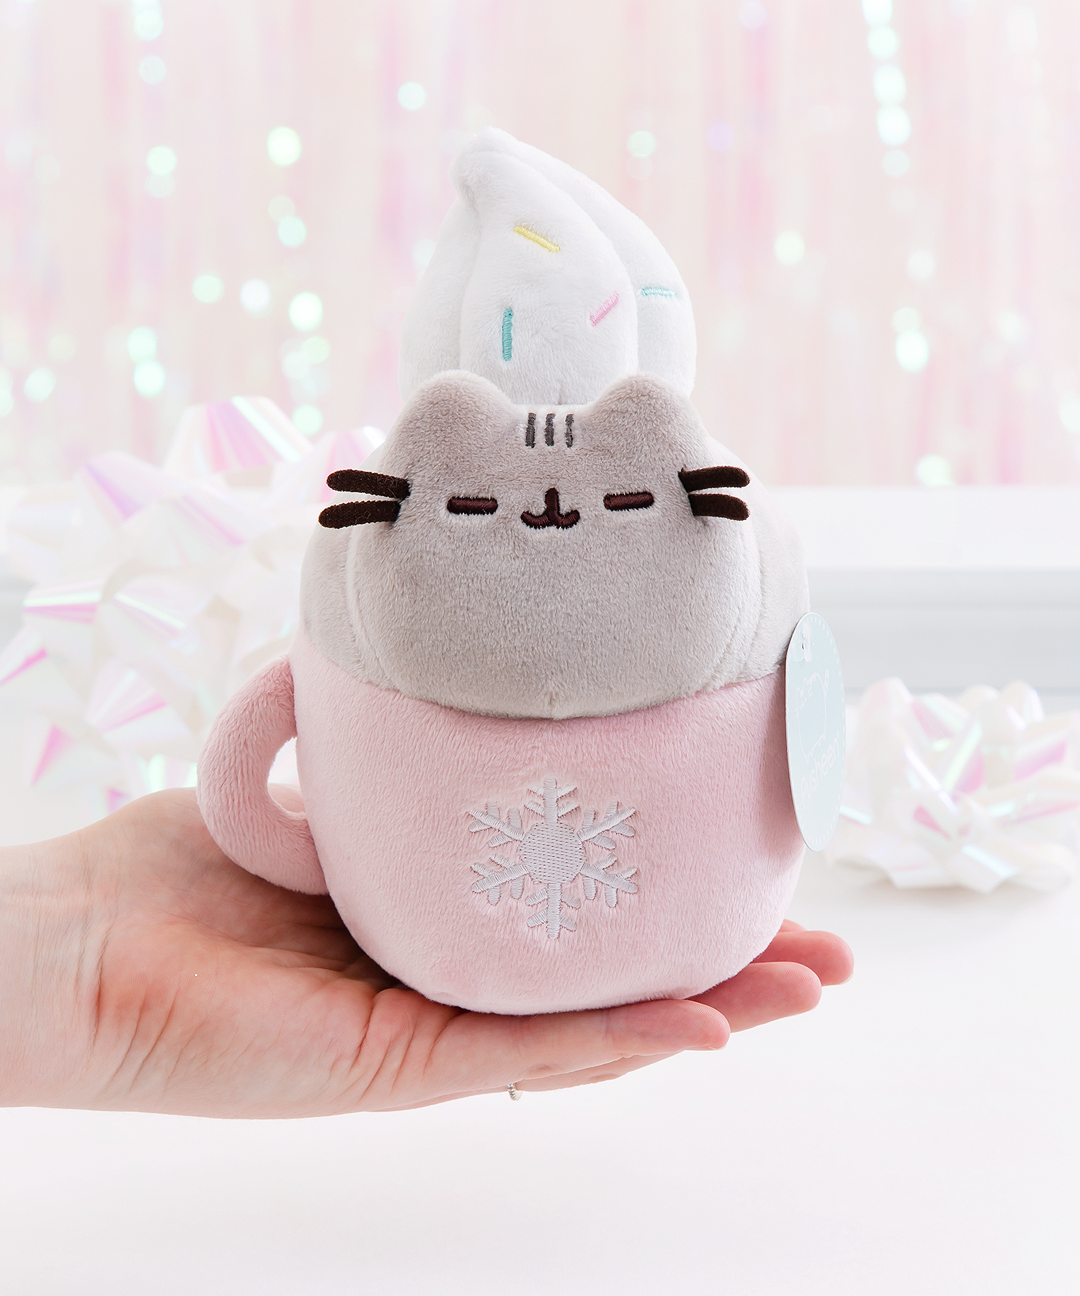 Predownload: Limited Edition Catpusheeno Plush Toy Pusheen Plush Pusheen Plushie Pusheen Cat Merchandise [ 1296 x 1080 Pixel ]